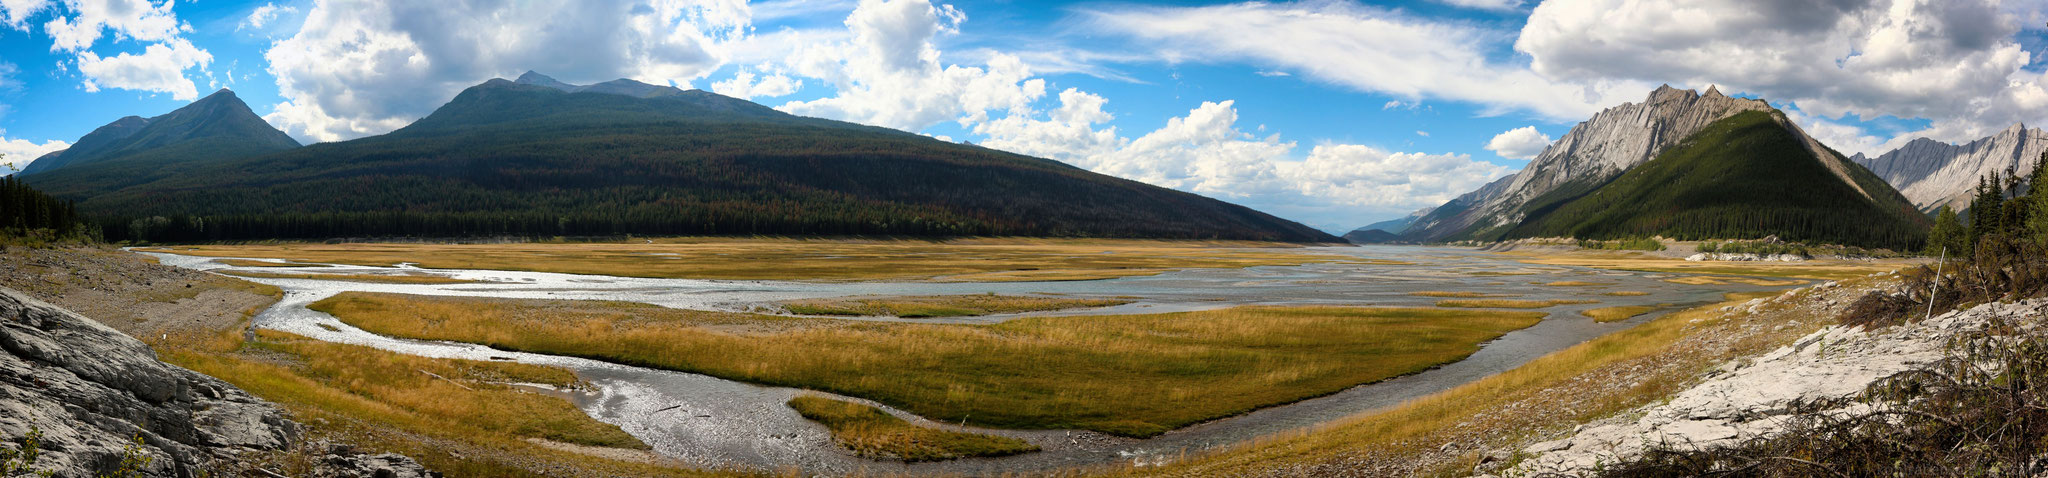 Der Medicine Lake